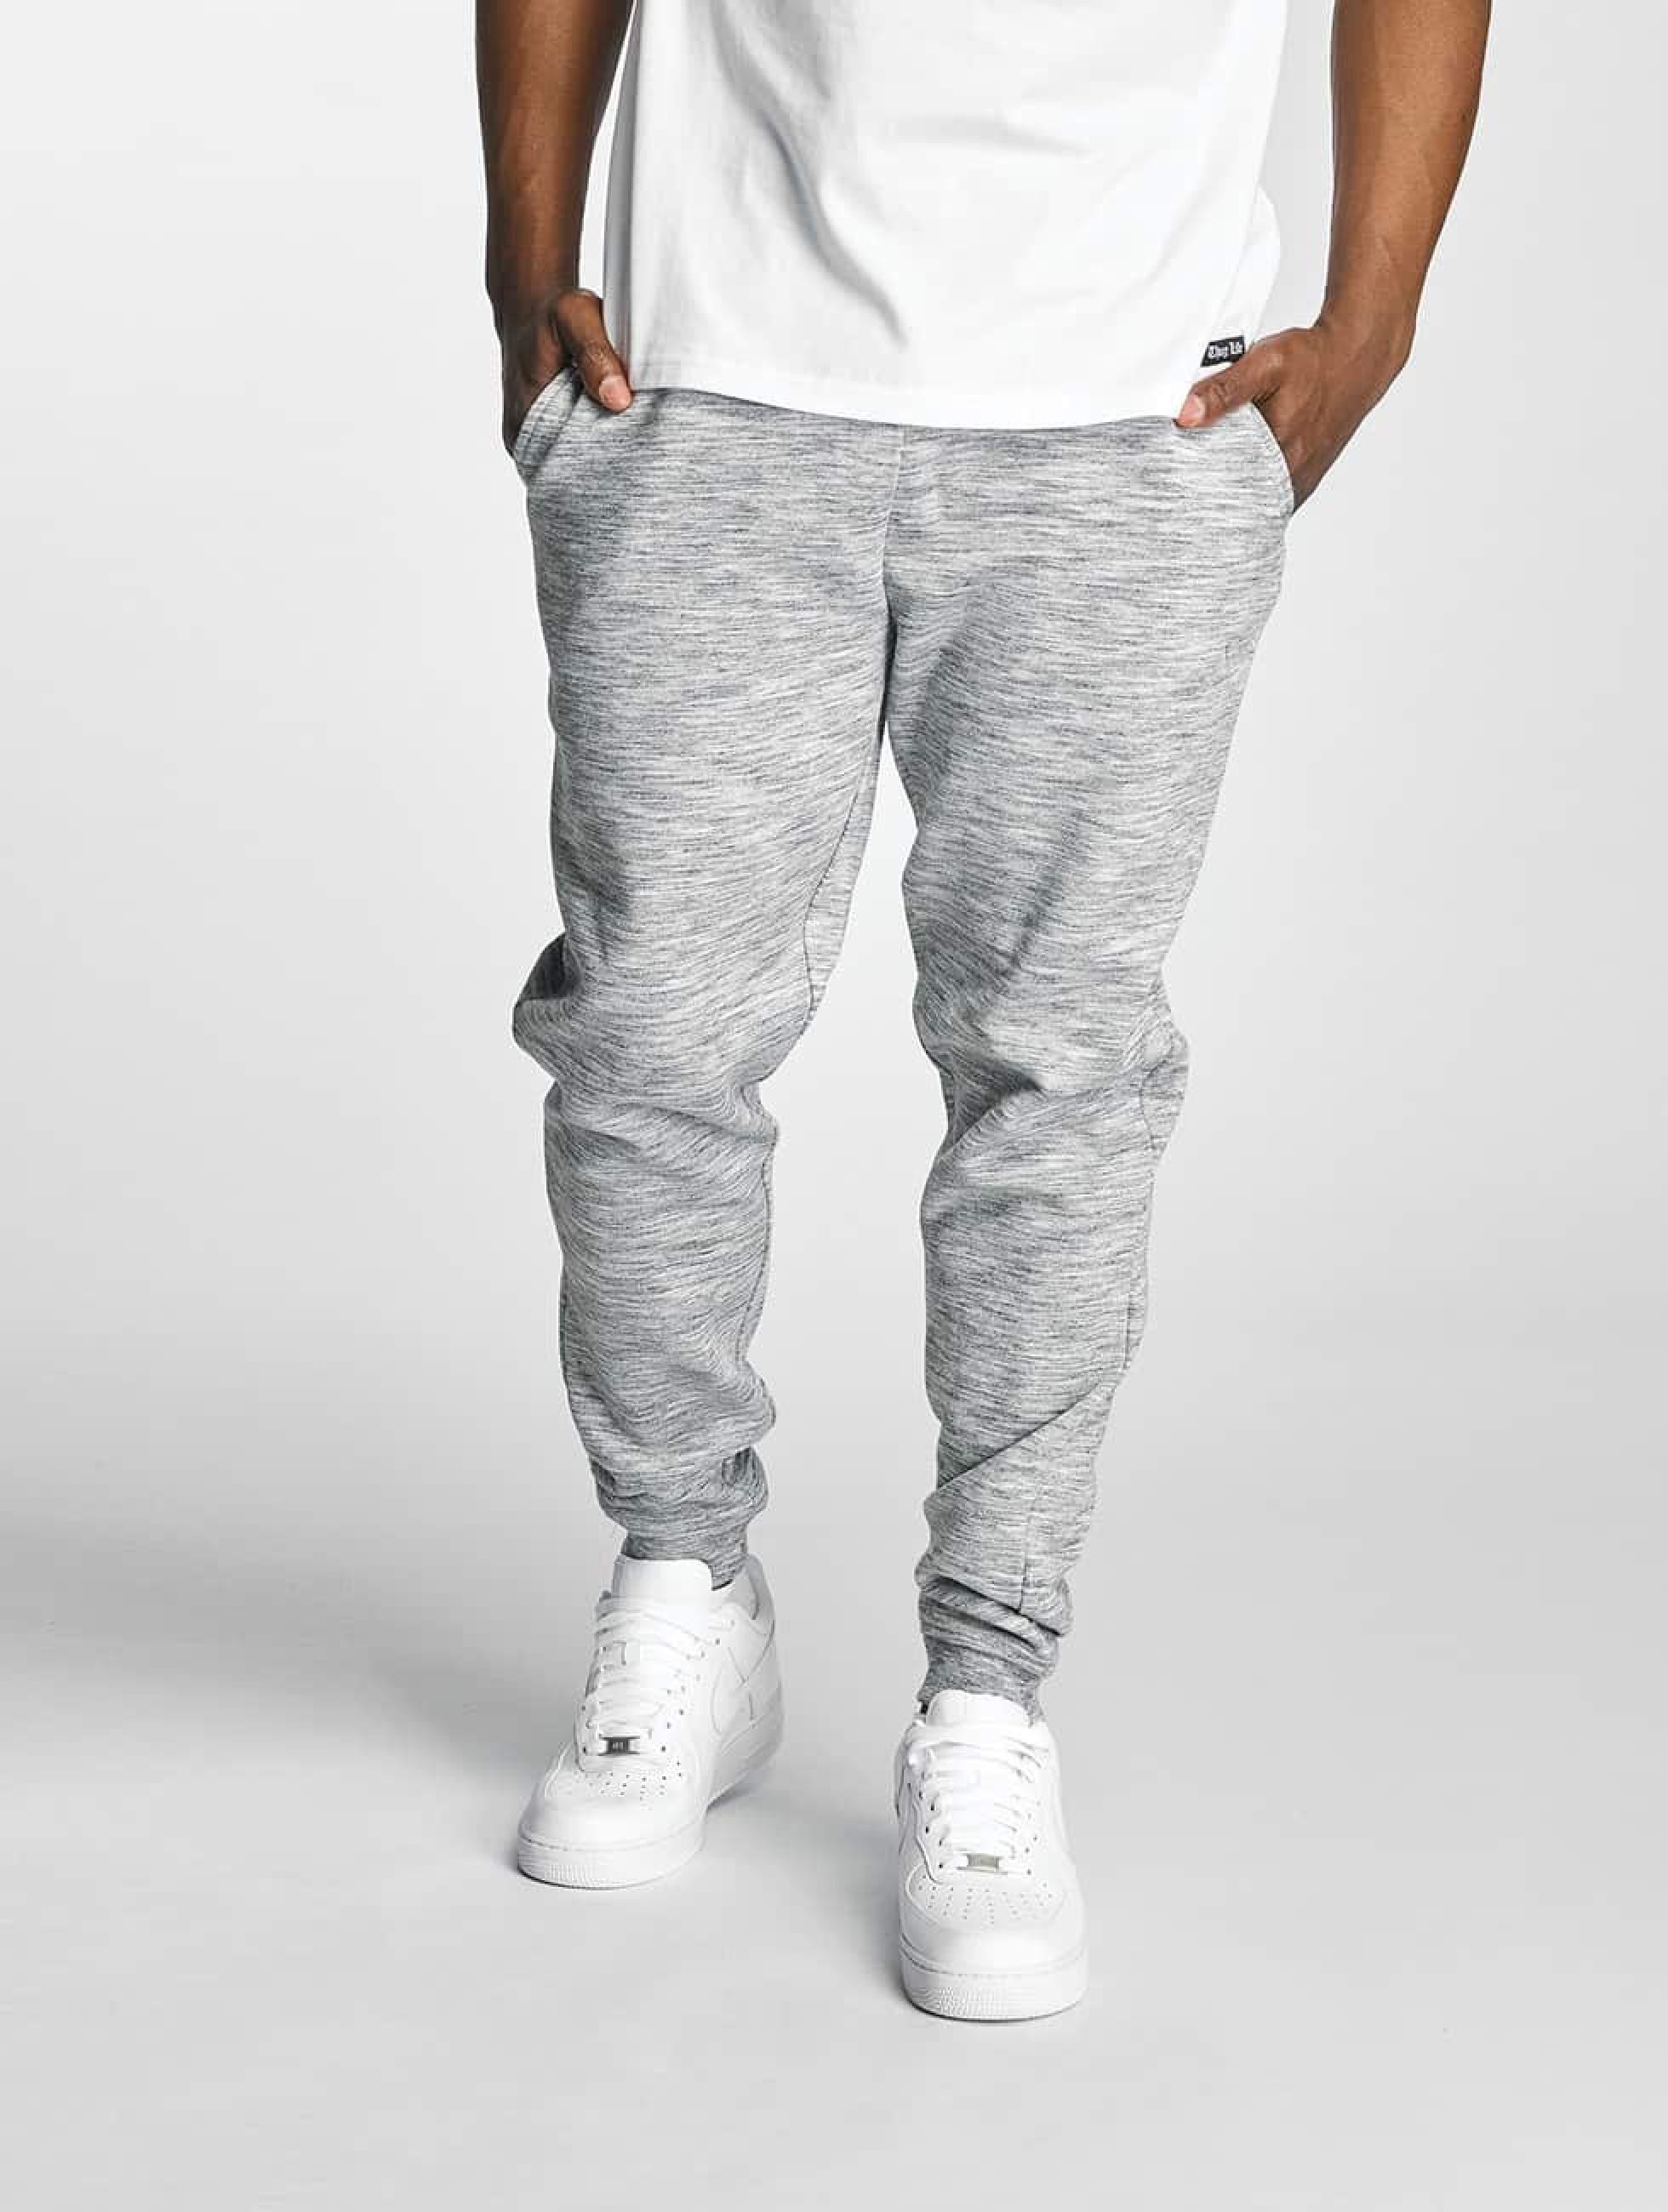 Thug Life / Sweat Pant Doubtless in grey 3XL